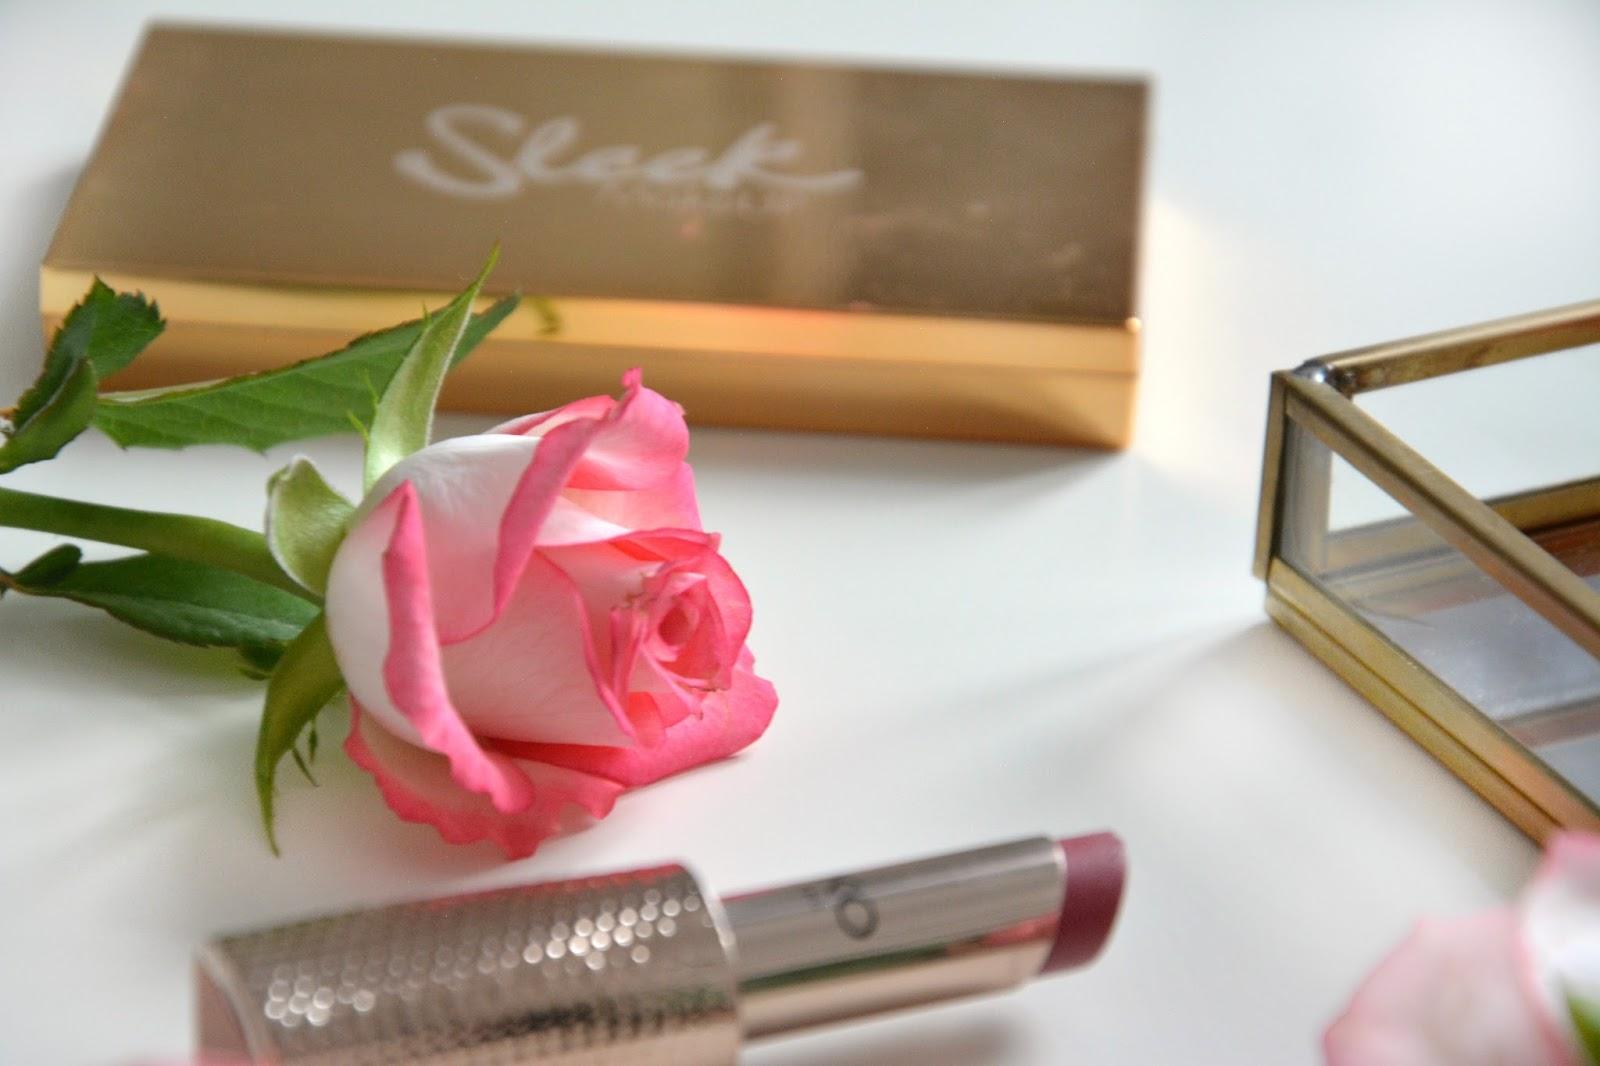 Sleek Solstice Highlighting Palette; Kiko Lipstick; Fresh Pink Roses